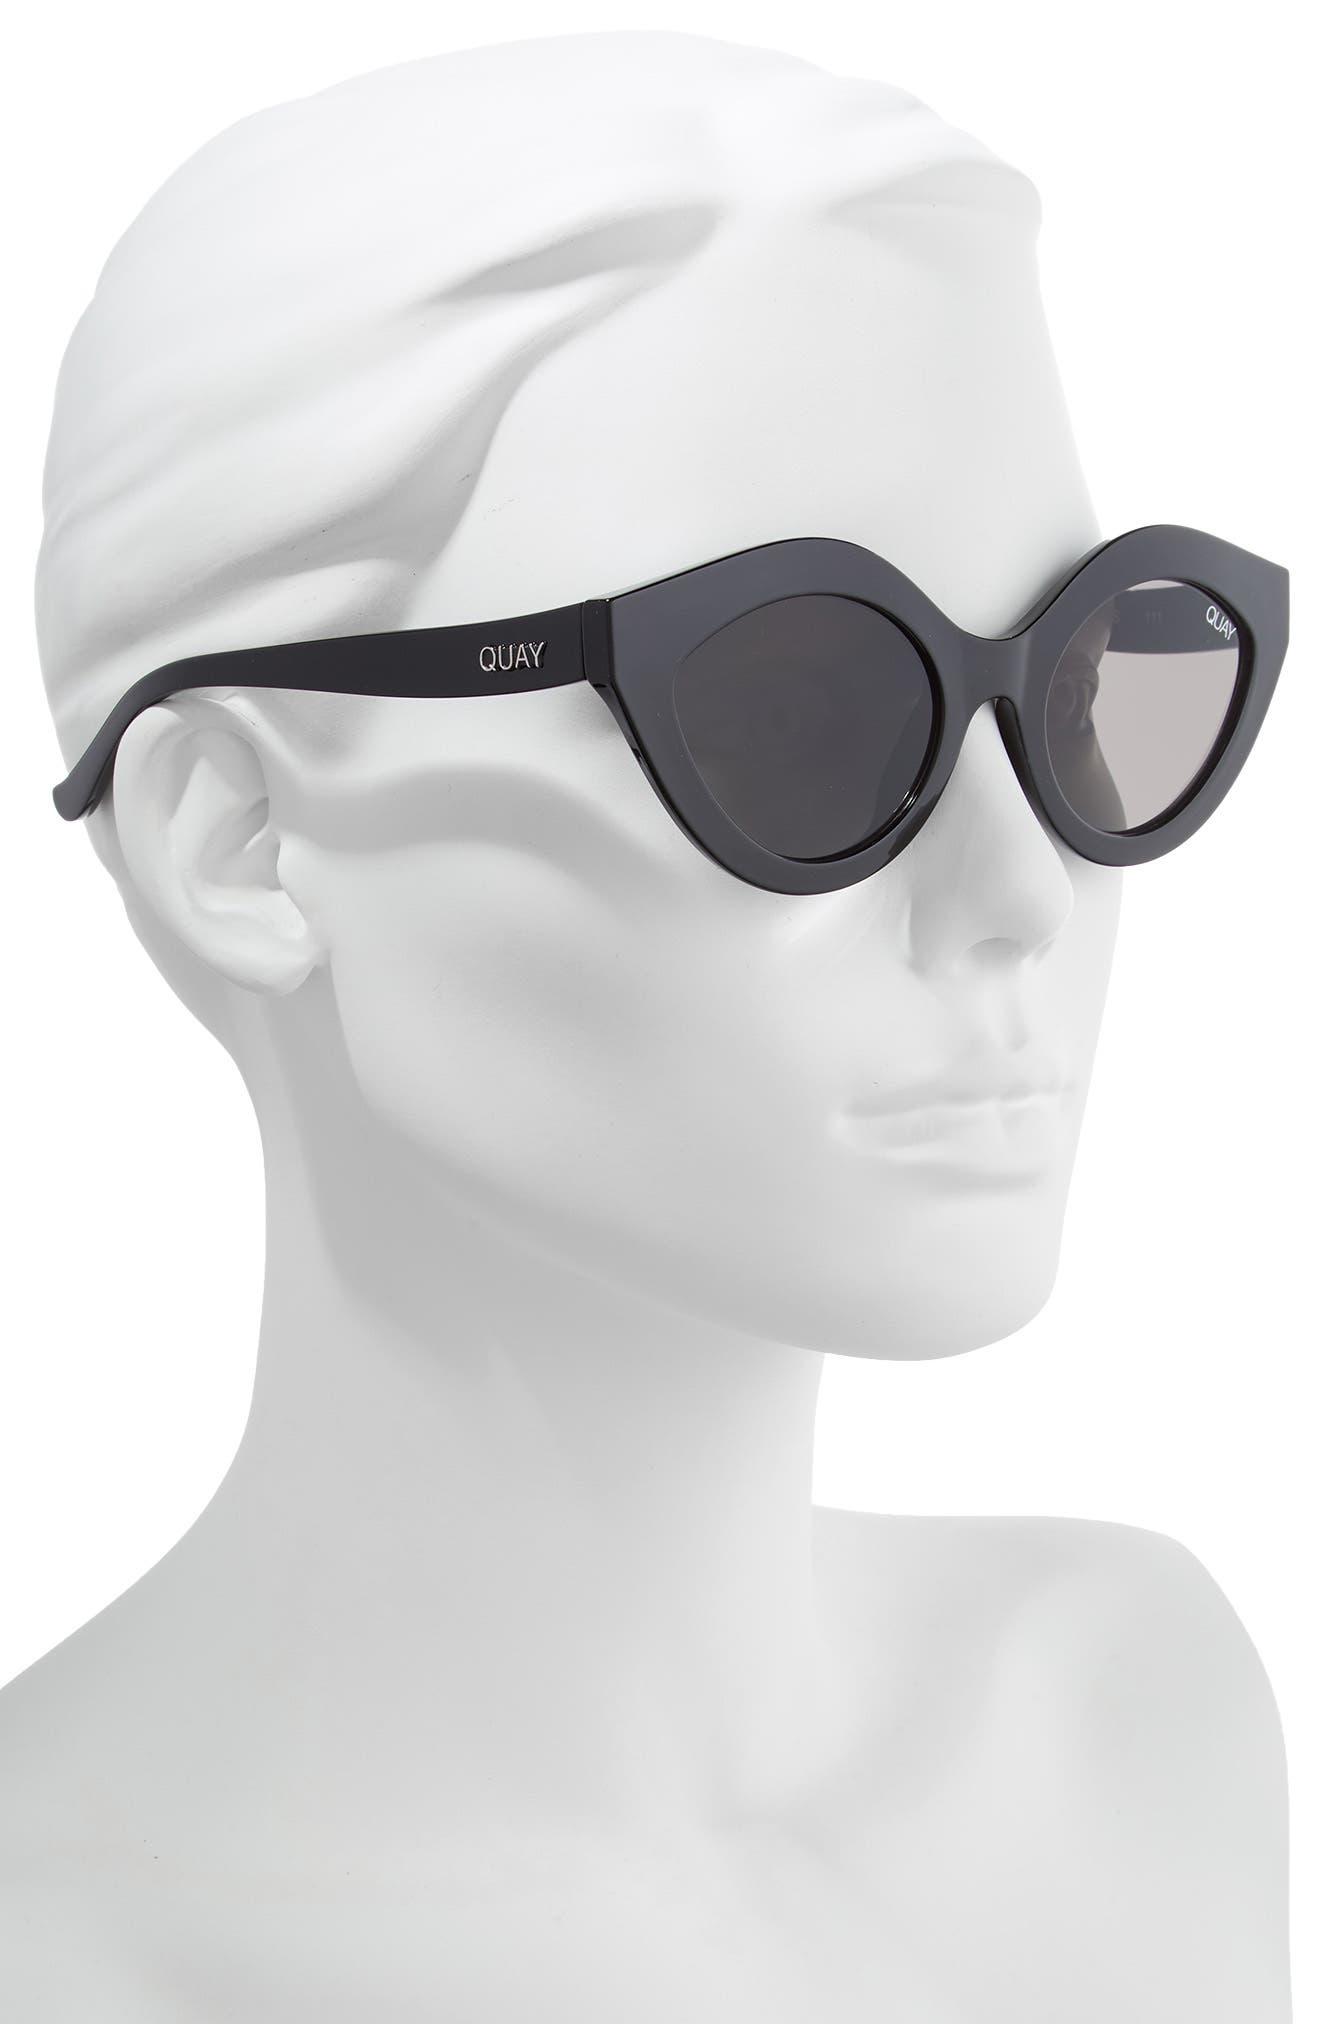 QUAY AUSTRALIA, Goodnight Kiss Cat Eye Sunglasses, Alternate thumbnail 2, color, BLACK / SMOKE